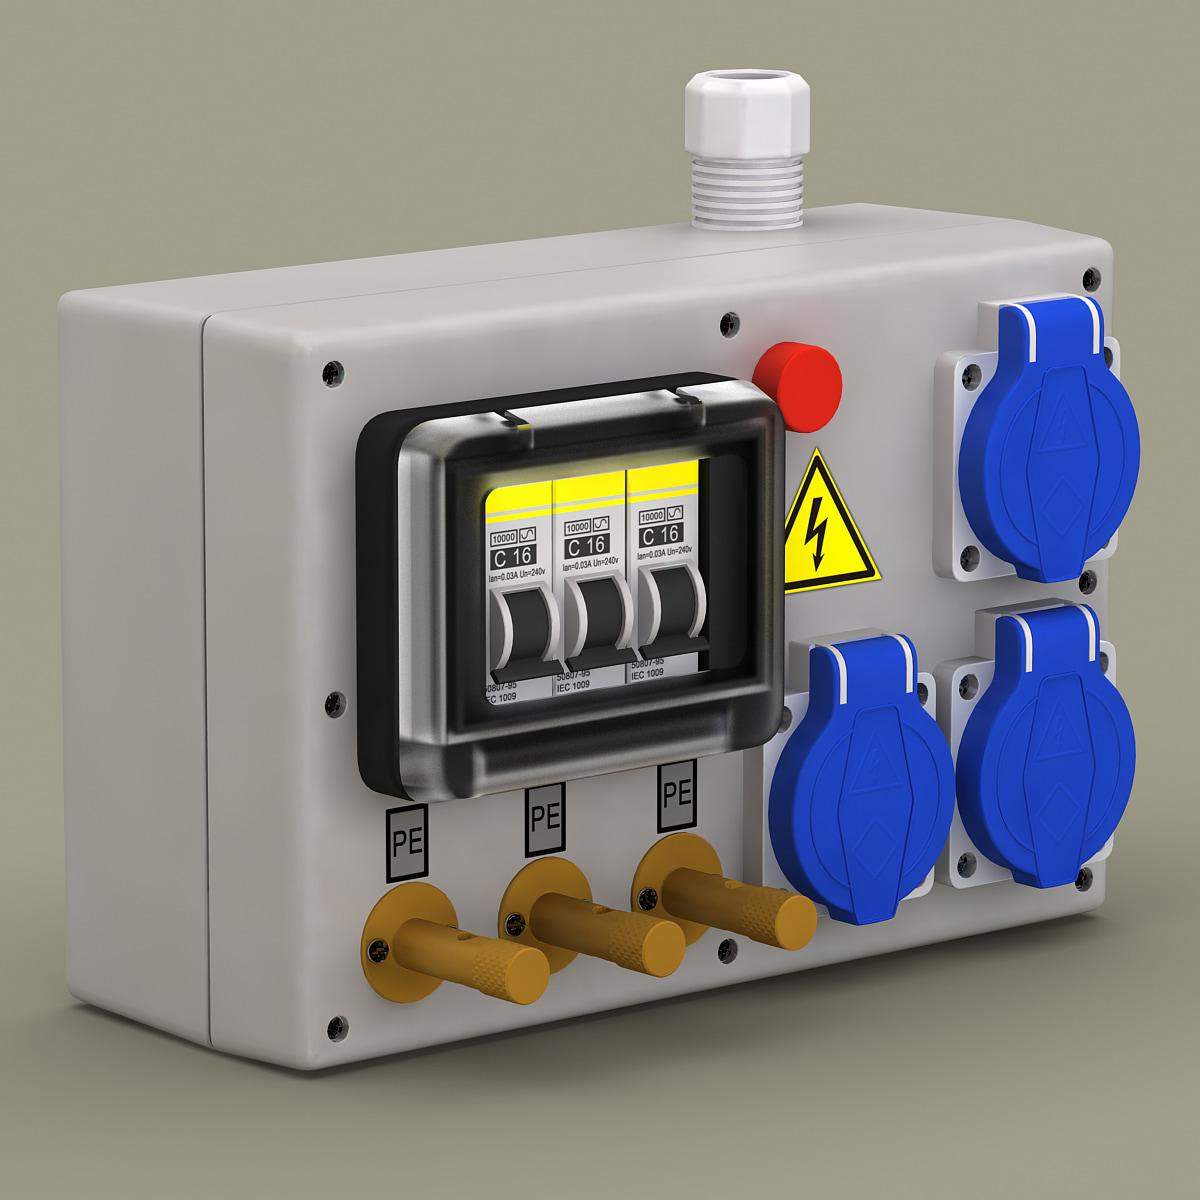 Electrical_Panel_Board_001.jpg